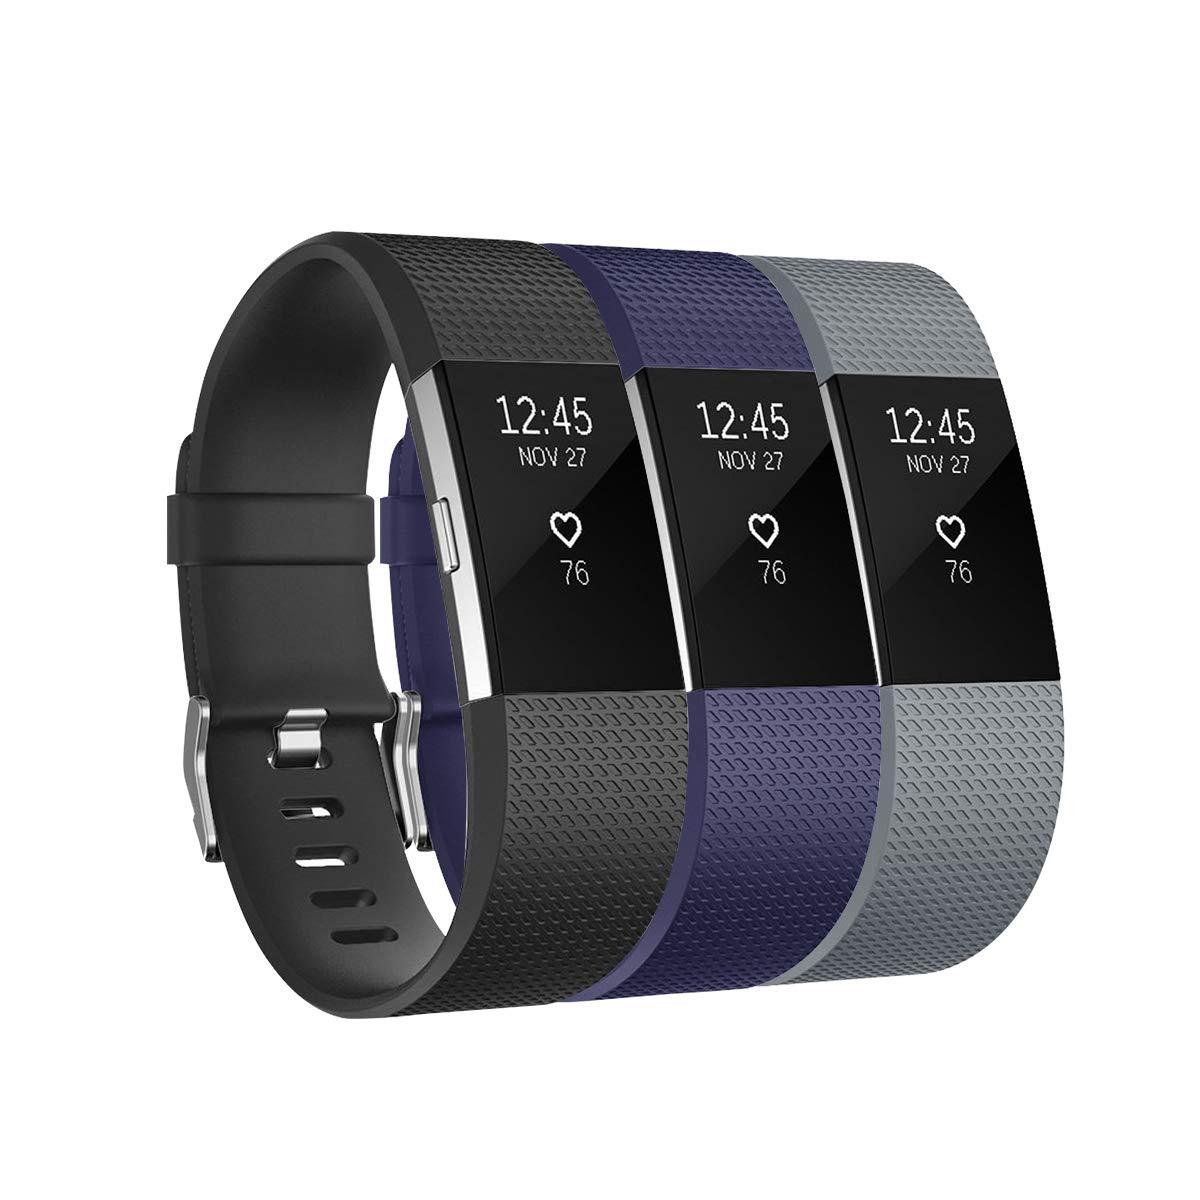 Fundro Fitbit Charge 2用バンド 3本パック ソフト交換用リストバンド ストラップ ラージ スモールバンド 安全なメタルクラスプ Fitbit Charge 2 B07GM58ZXL A# 3-Pack (Black+Gray+Navy Blue) Large (6.5\